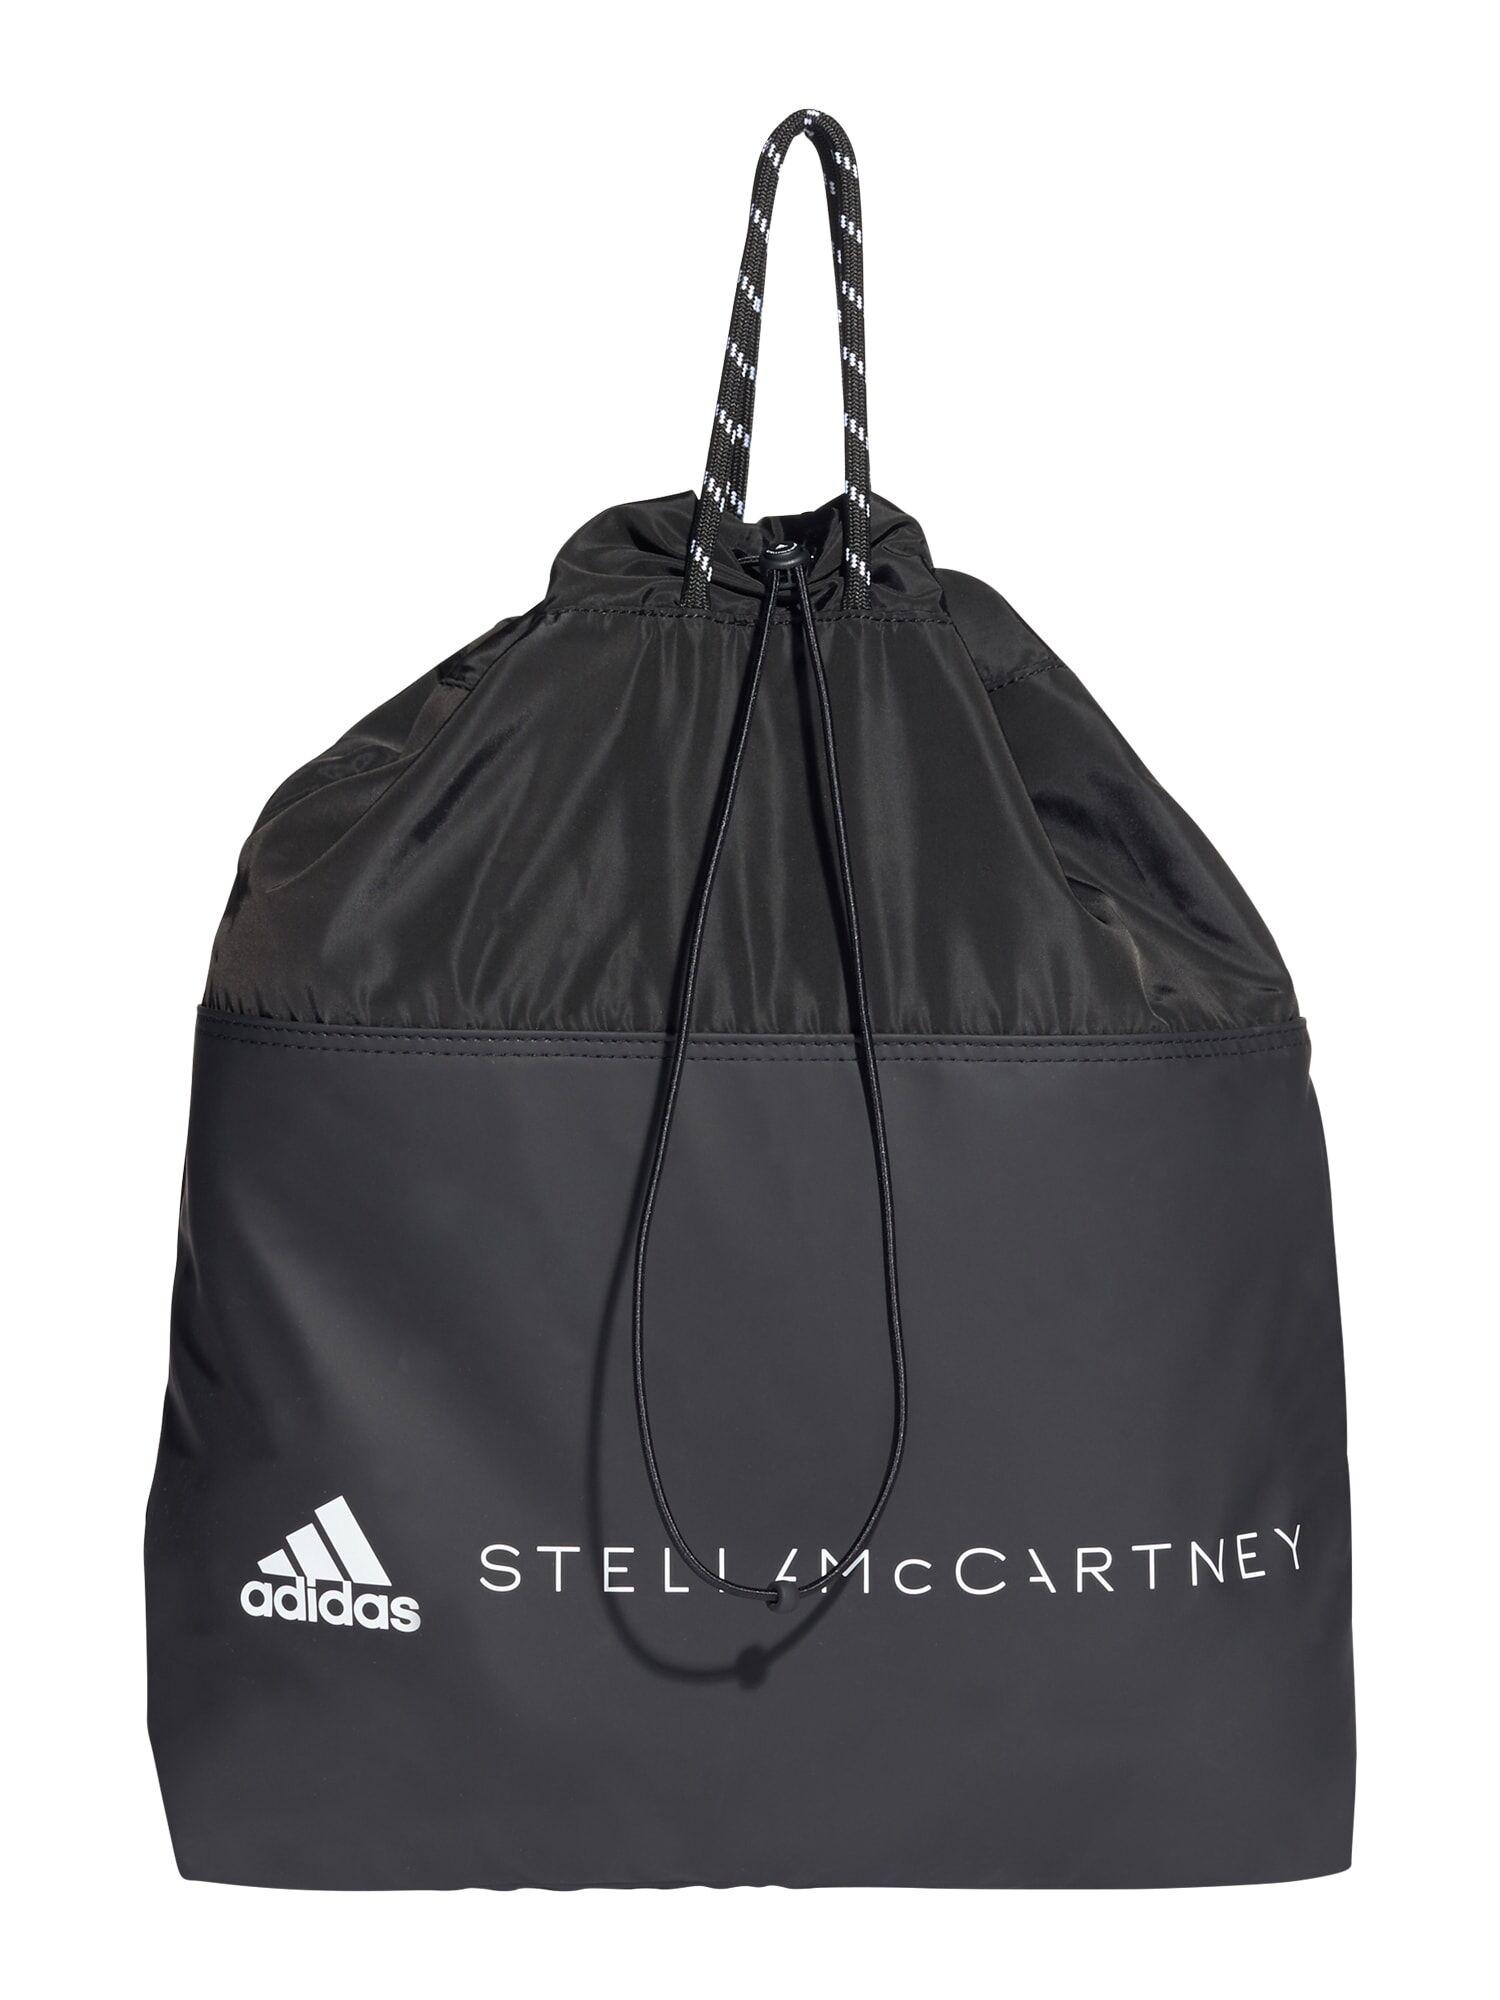 adidas by stella mccartney zaino sportivo nero